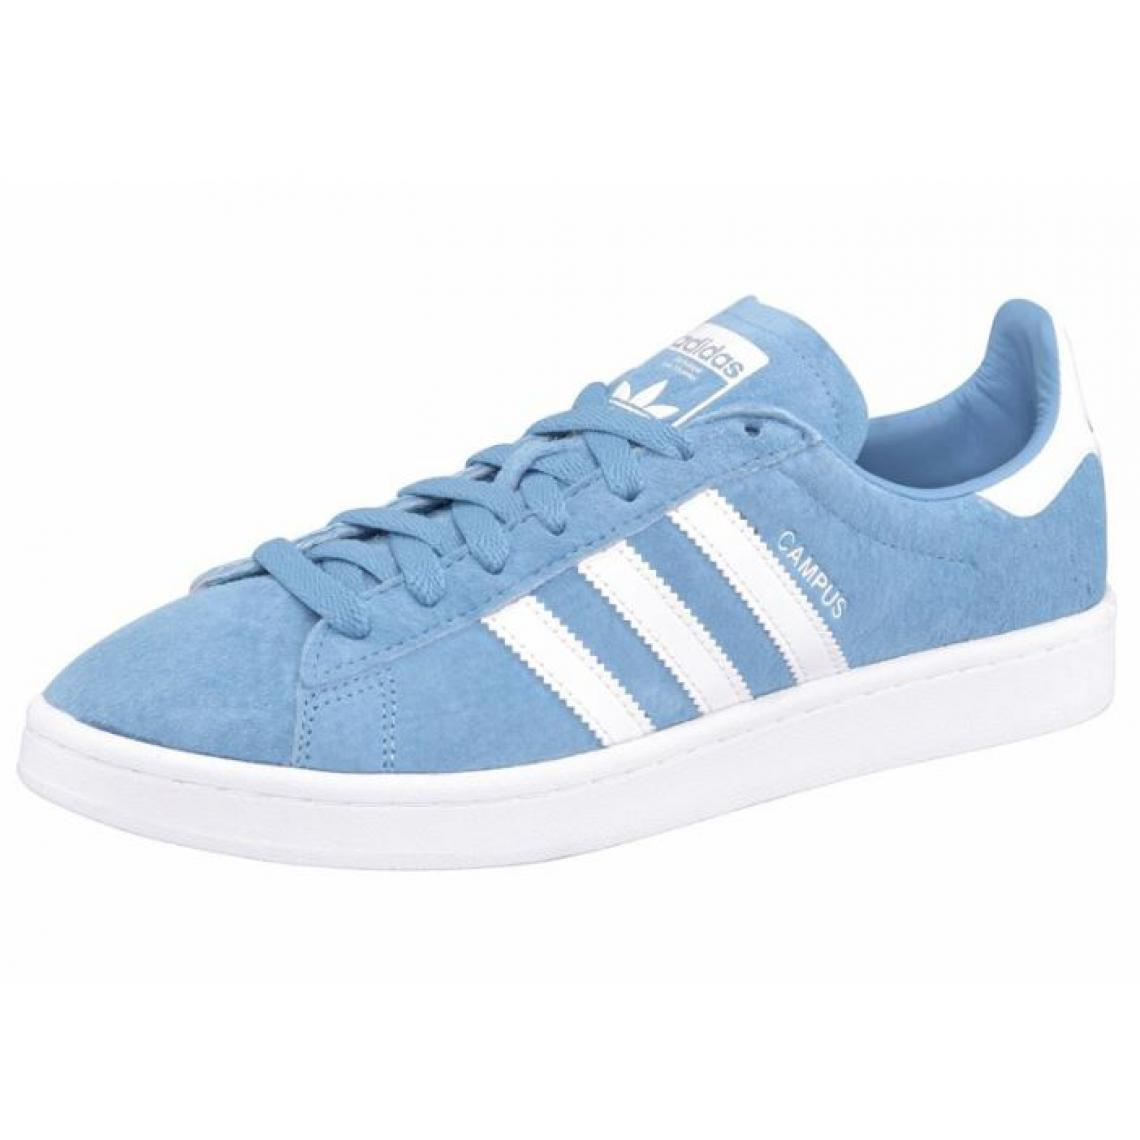 adidas campus femmes bleu